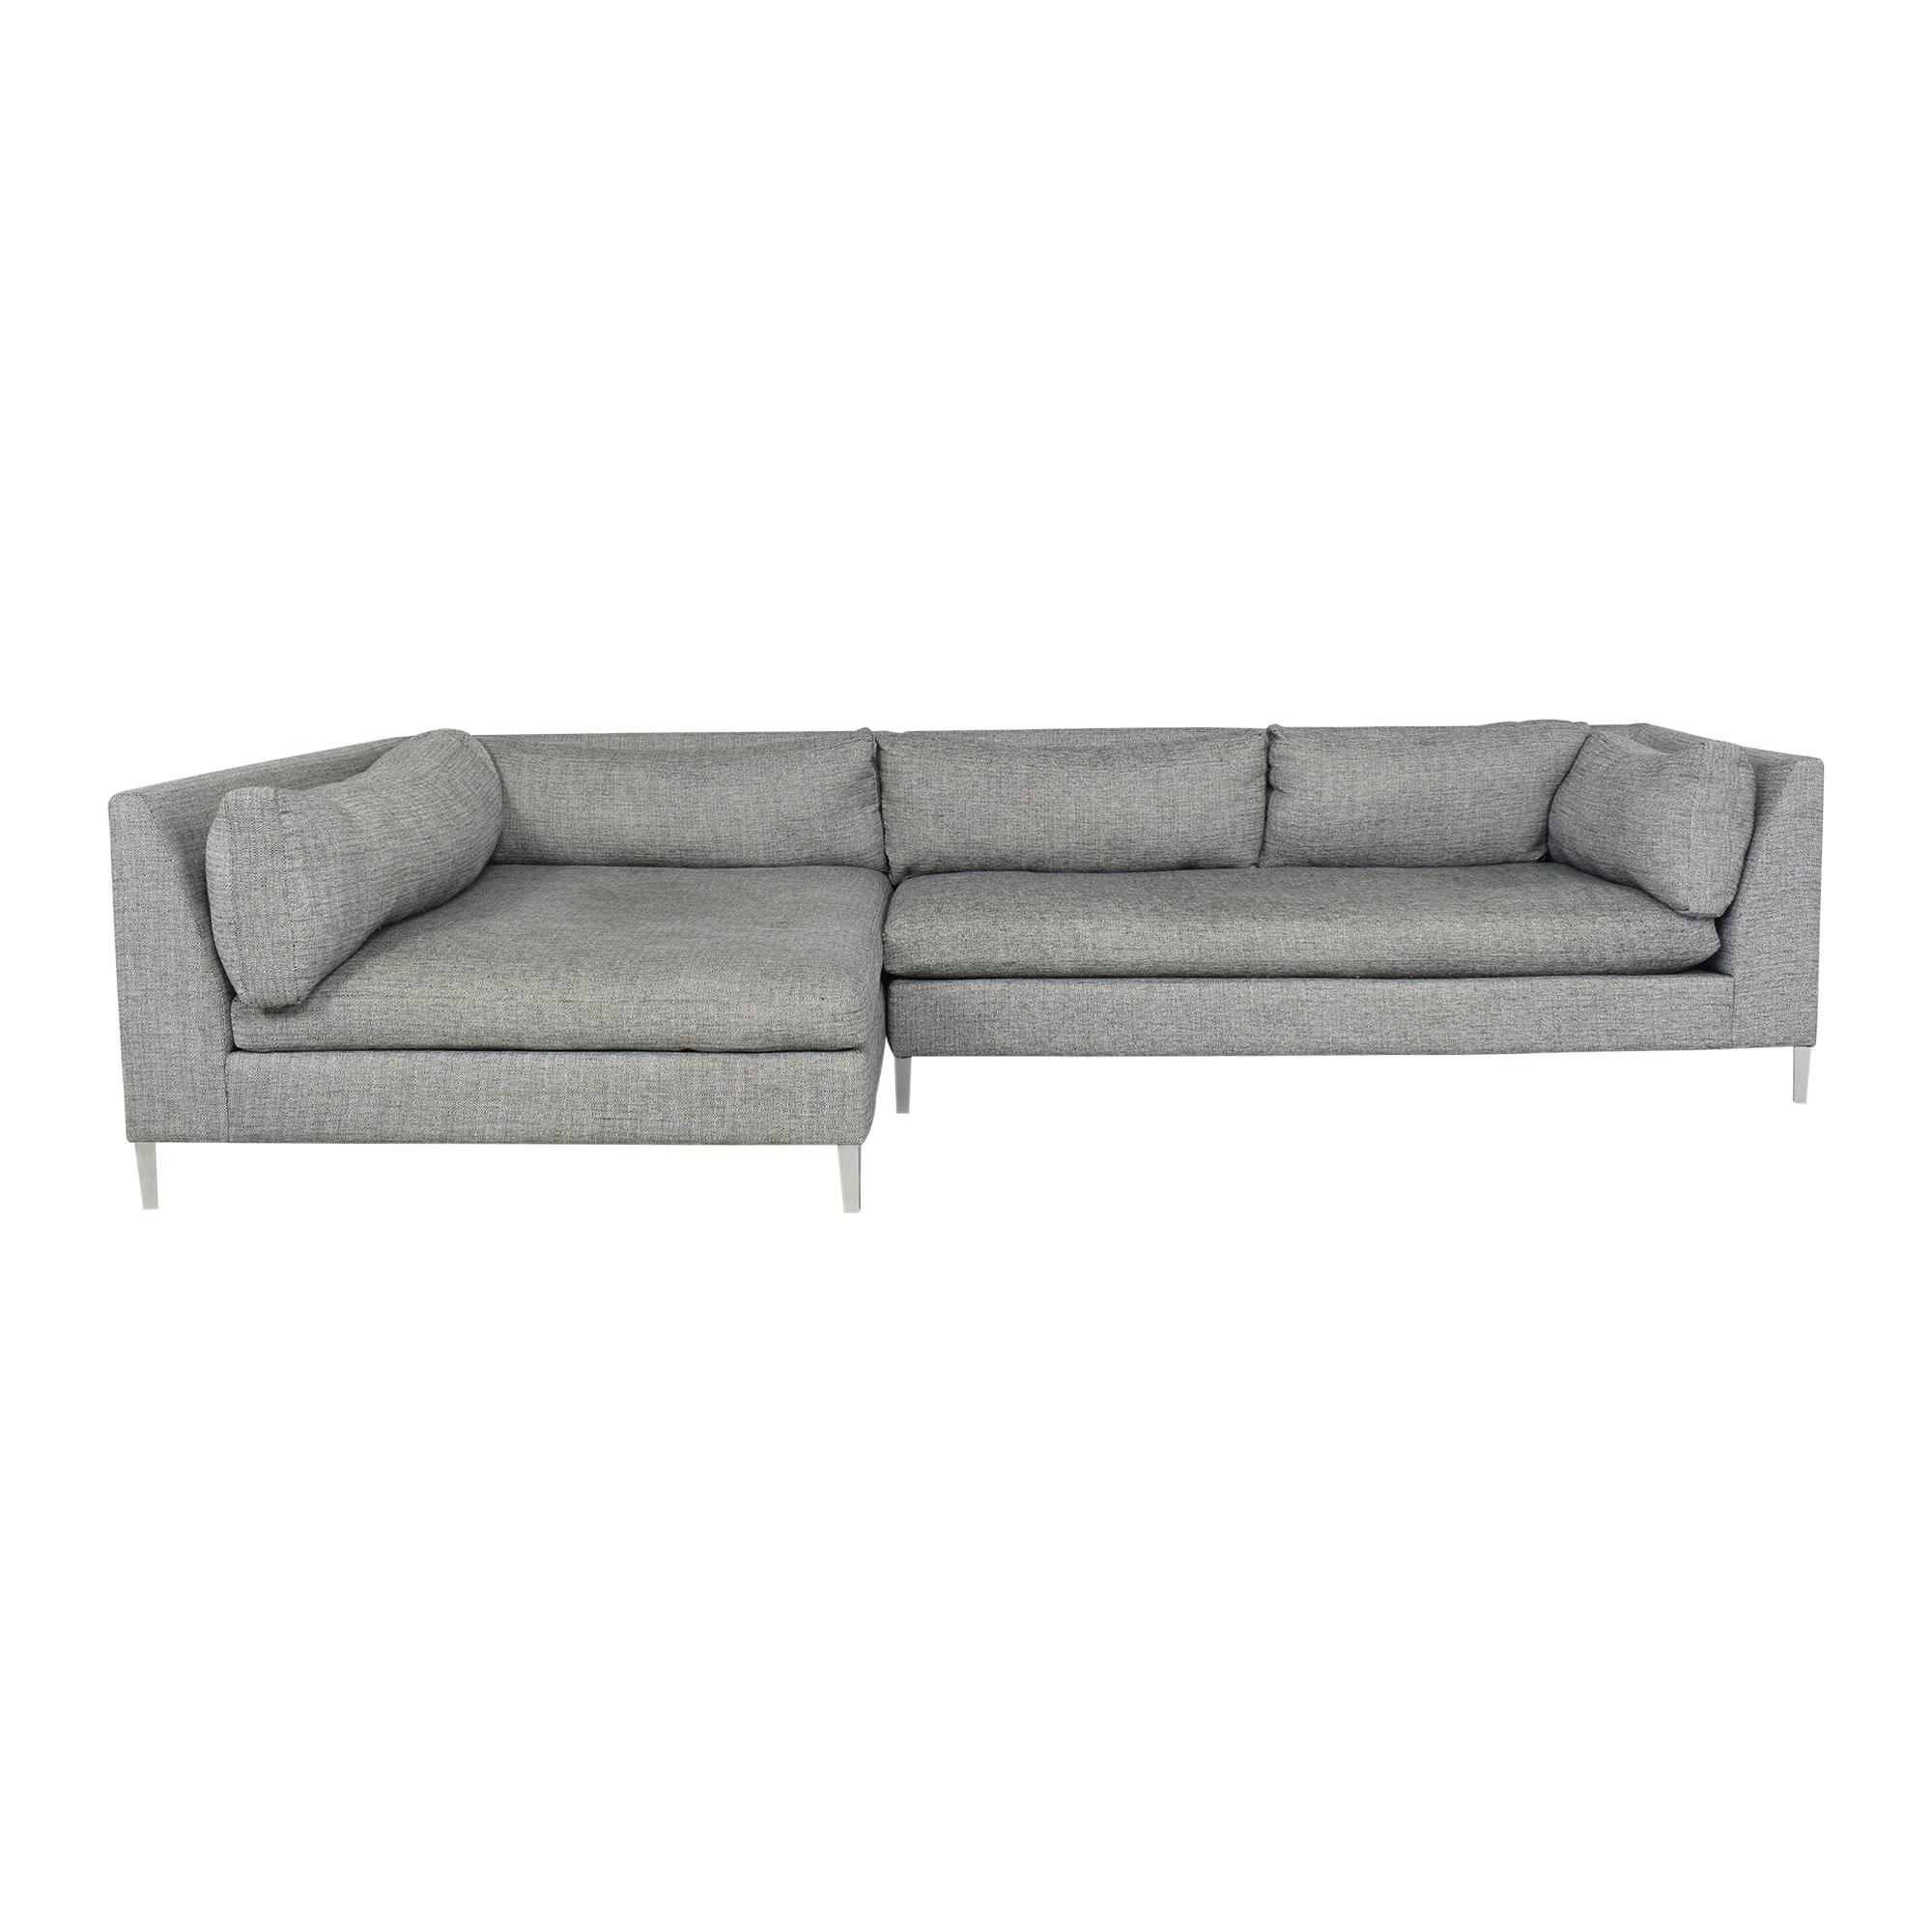 CB2 CB2 Decker Two Piece Sectional Sofa grey